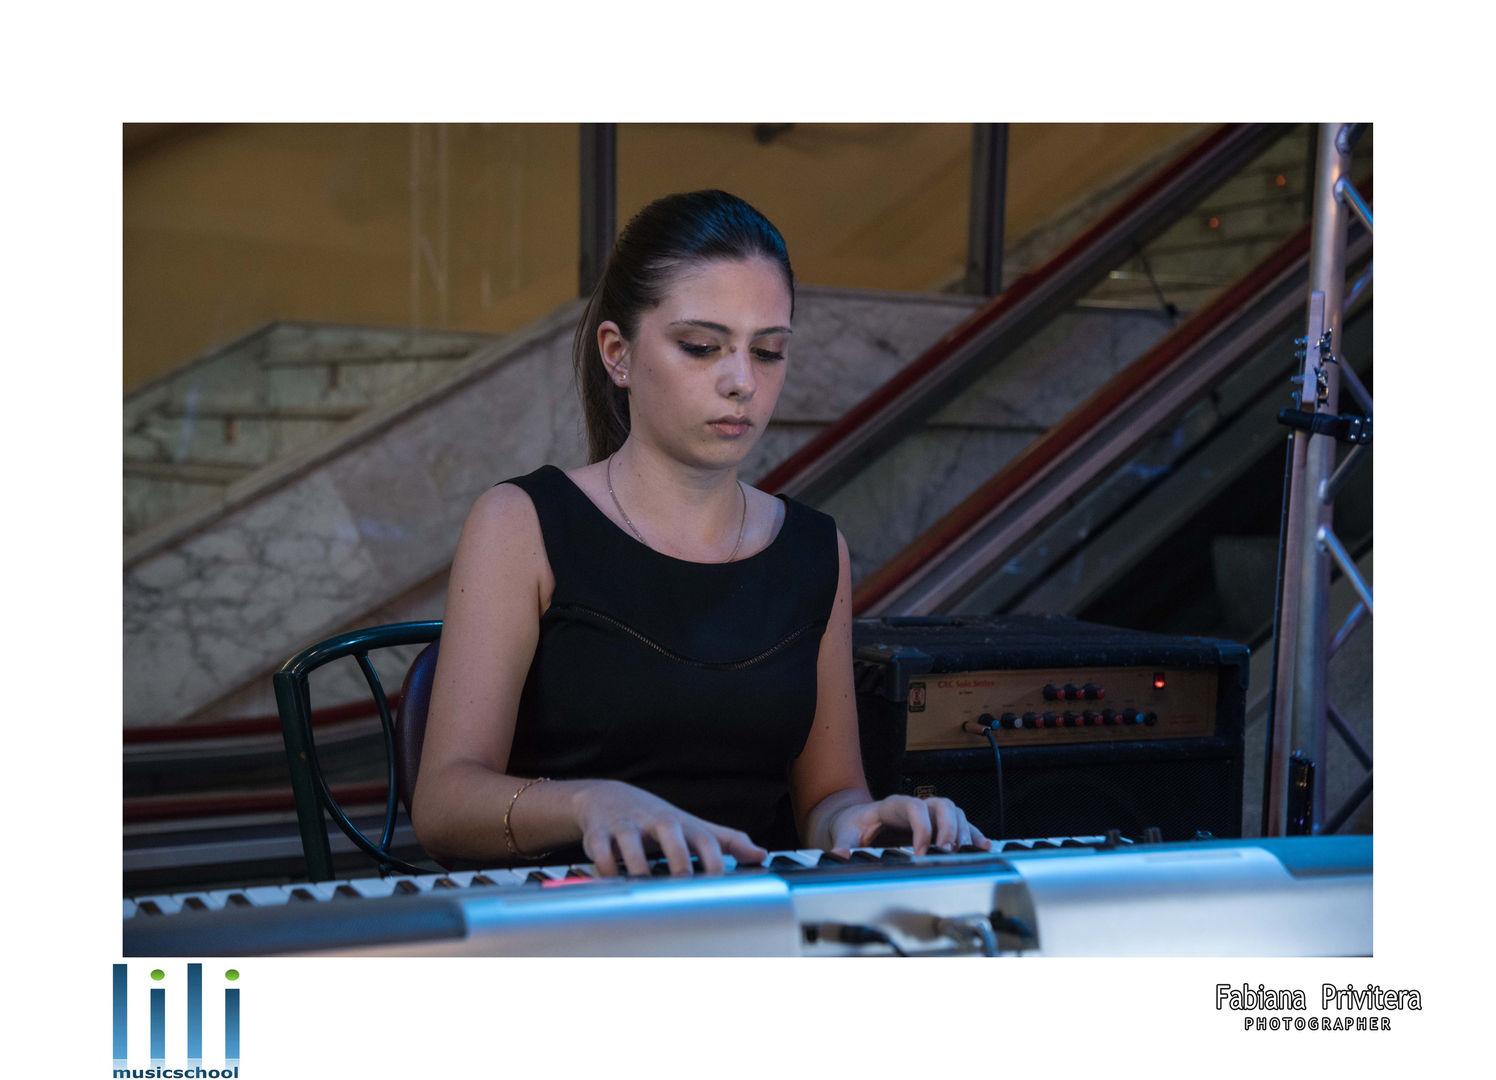 Bimbi lili 2018 Fabiana Privitera Photographer (91).jpg